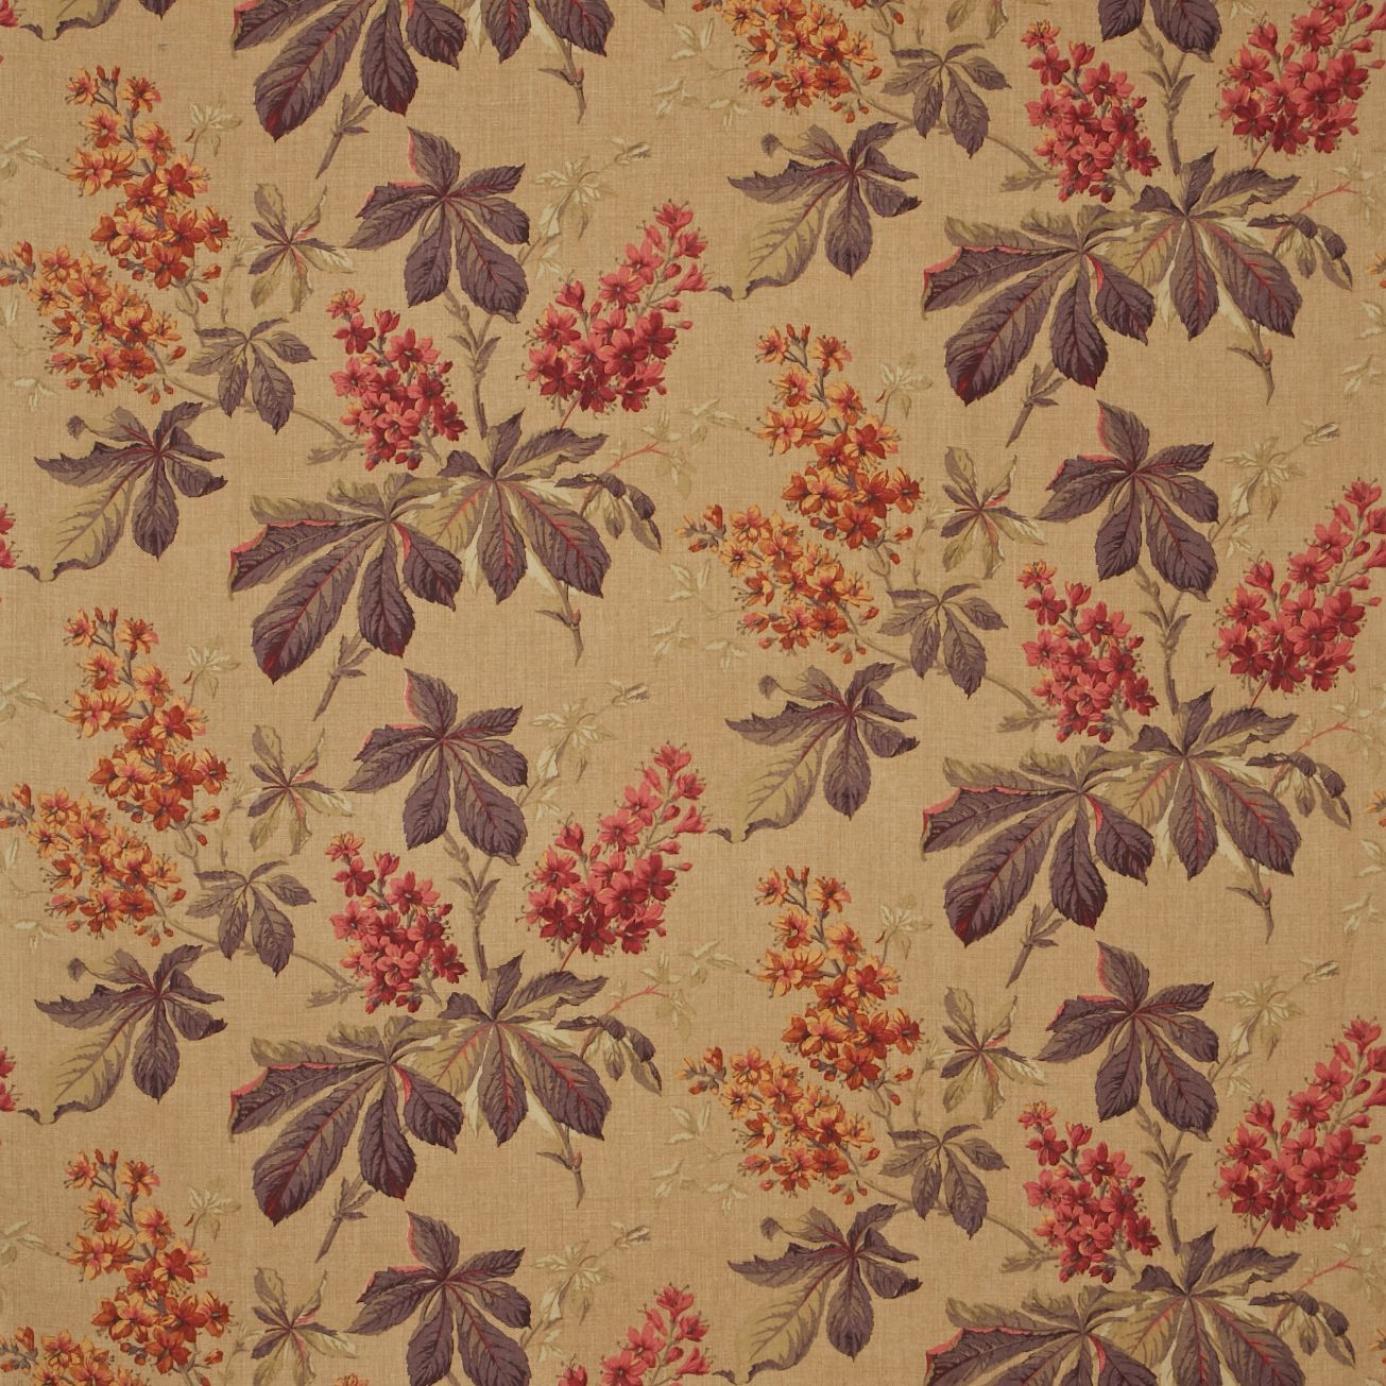 Pavia Fabric Amber Plum Dcoupa202 224430 Sanderson